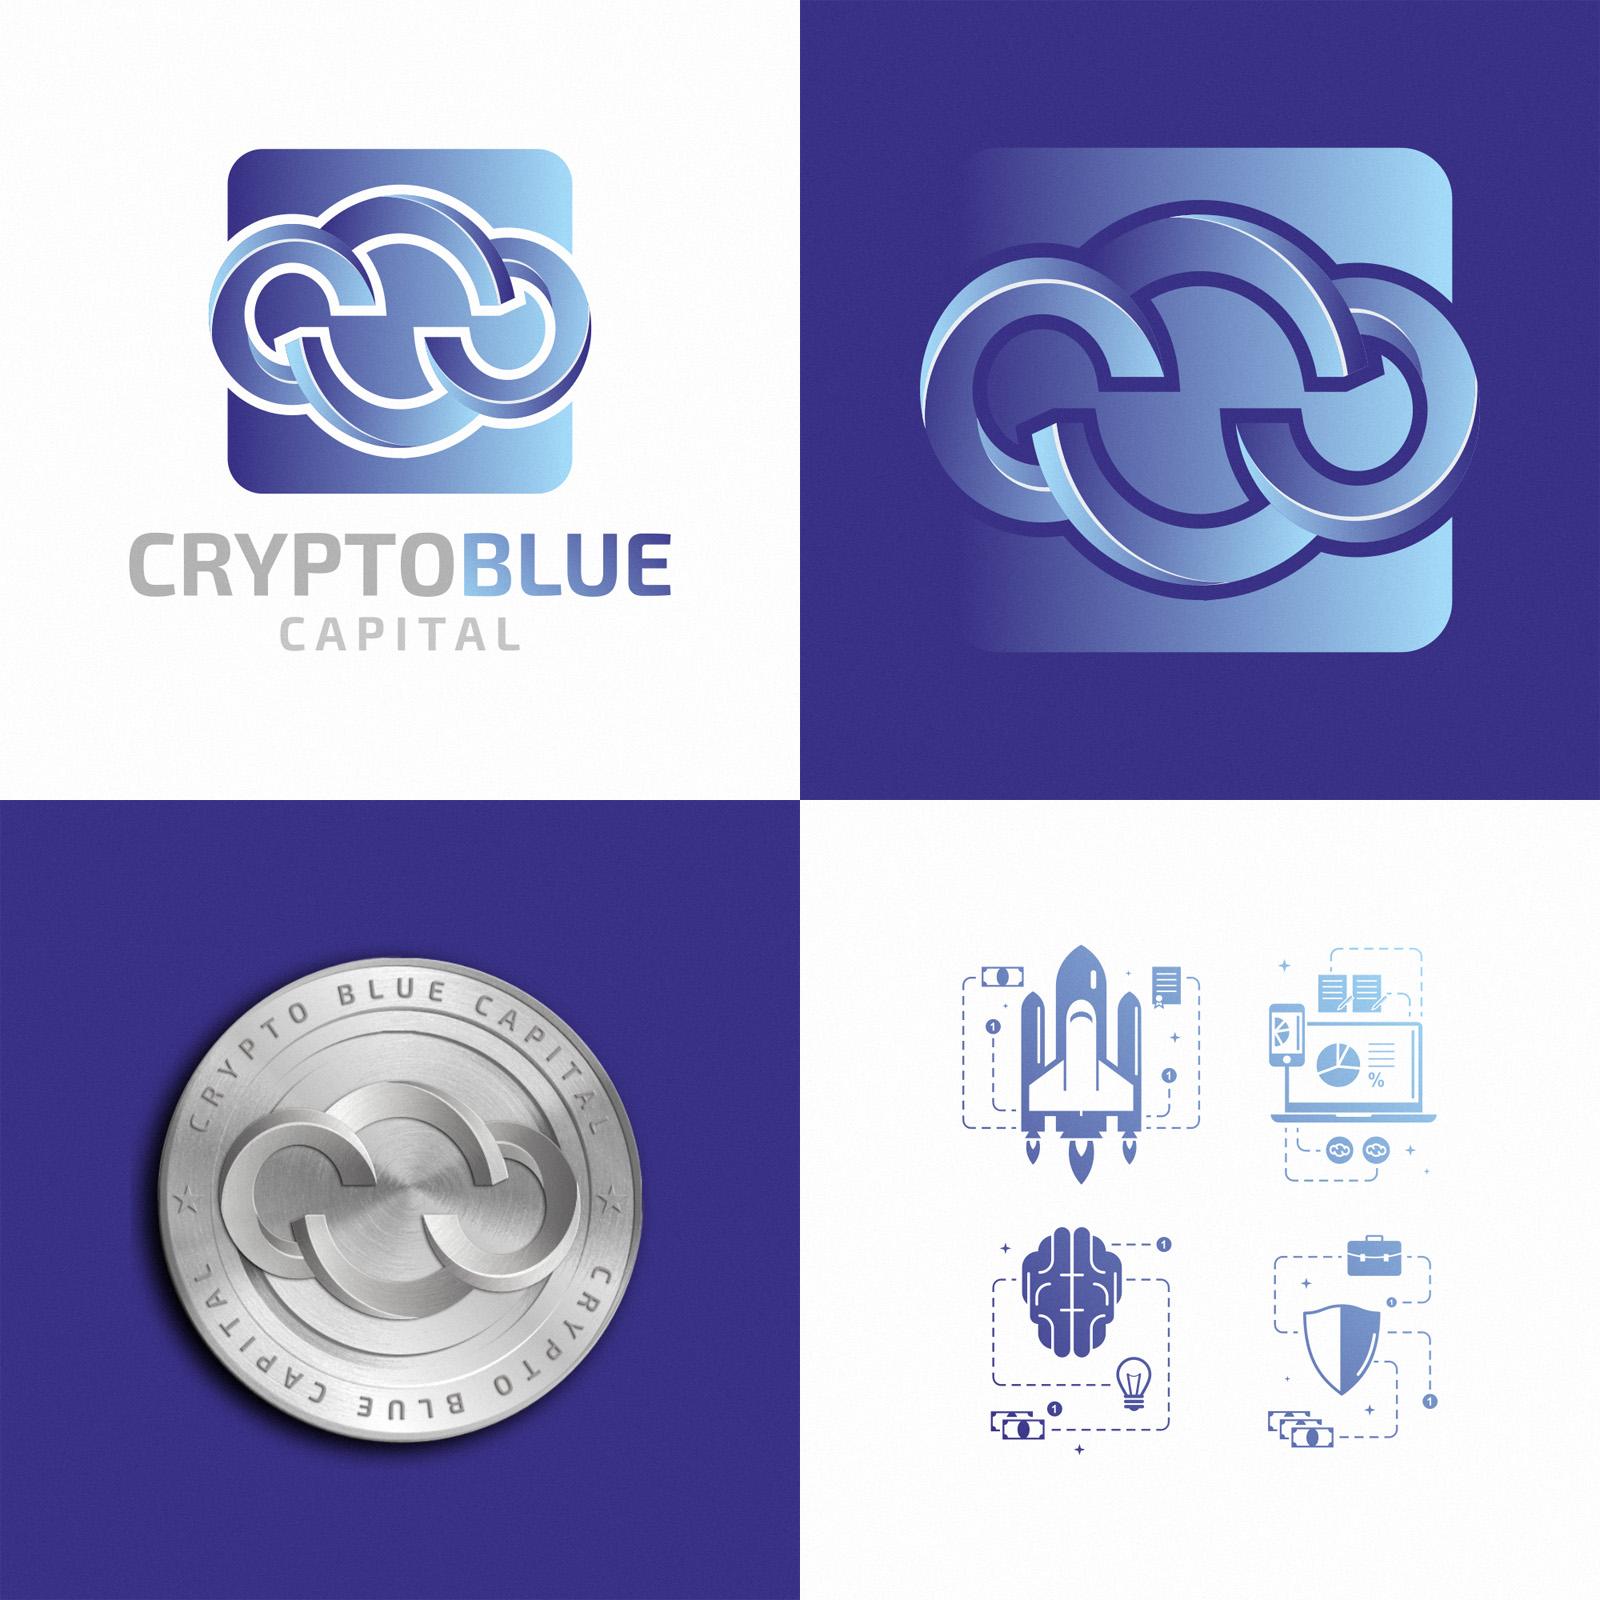 CryptoBlue